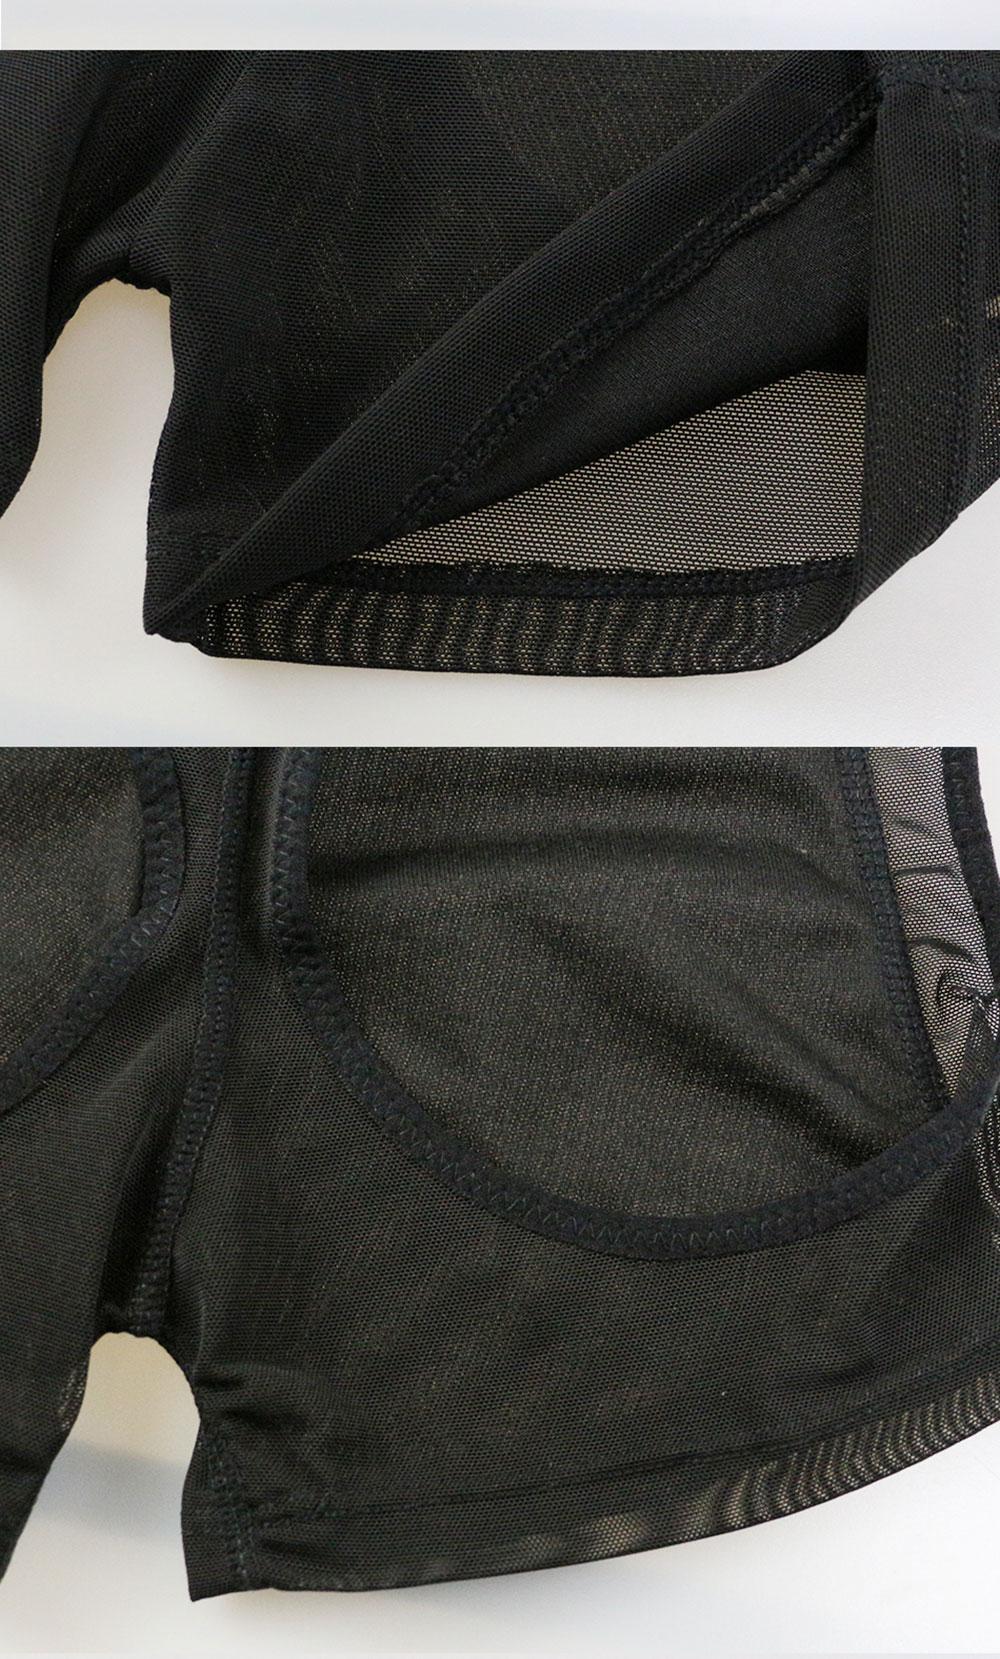 NB4001-2 Atbuty Sexy Butt Lifter Shaper Push Up Hips Enhancer Breathable Mesh Control Panty Butt Lift  Body Shaperwears (13)